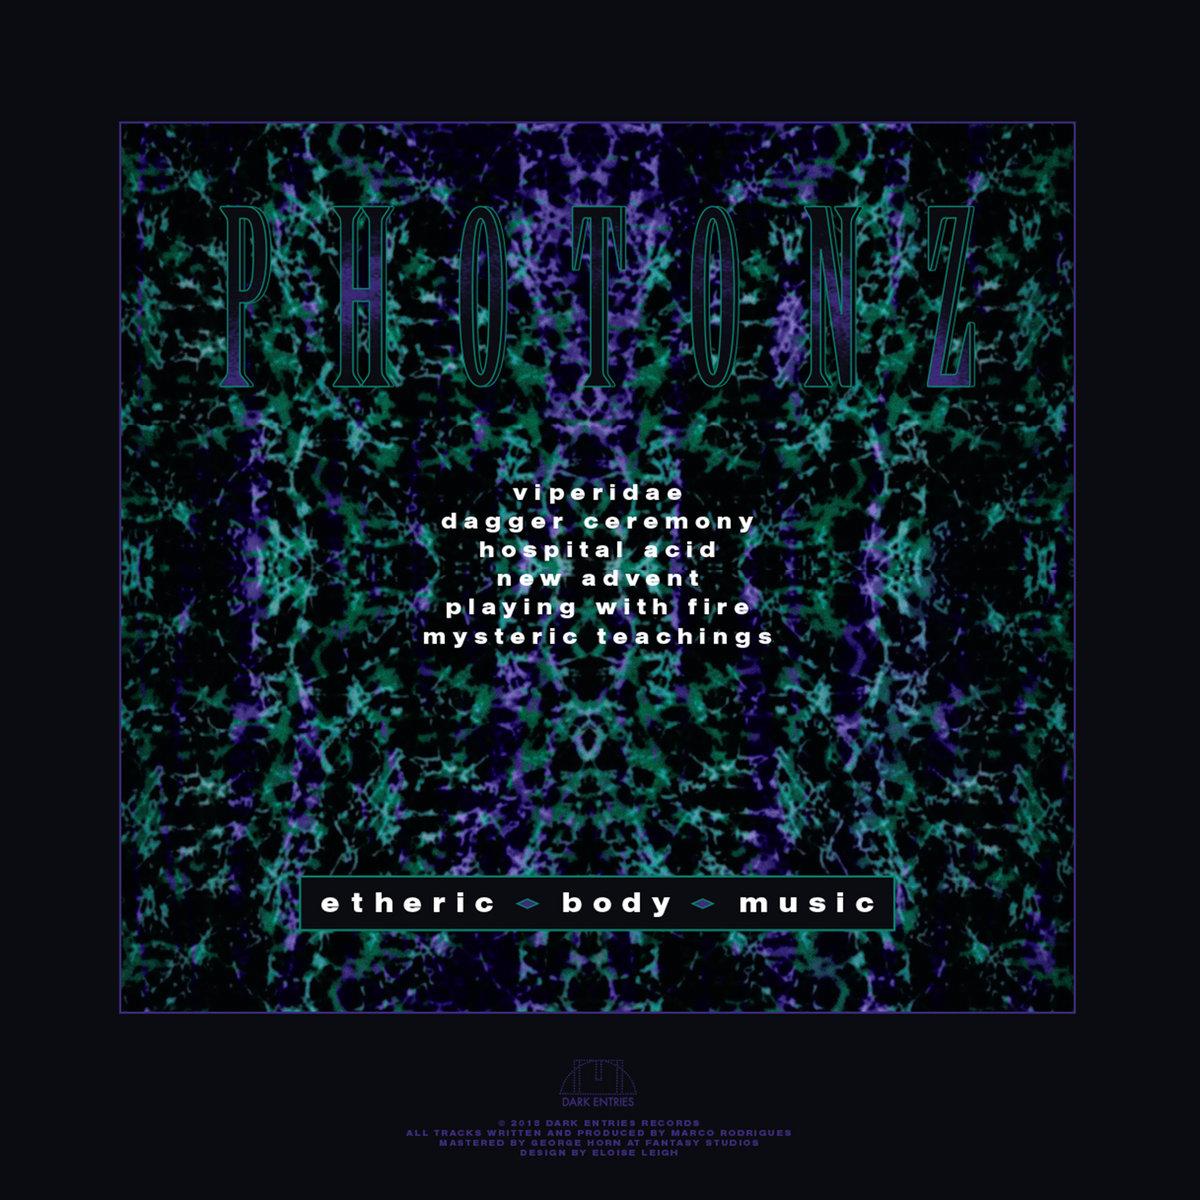 Etheric Body Music | Photonz